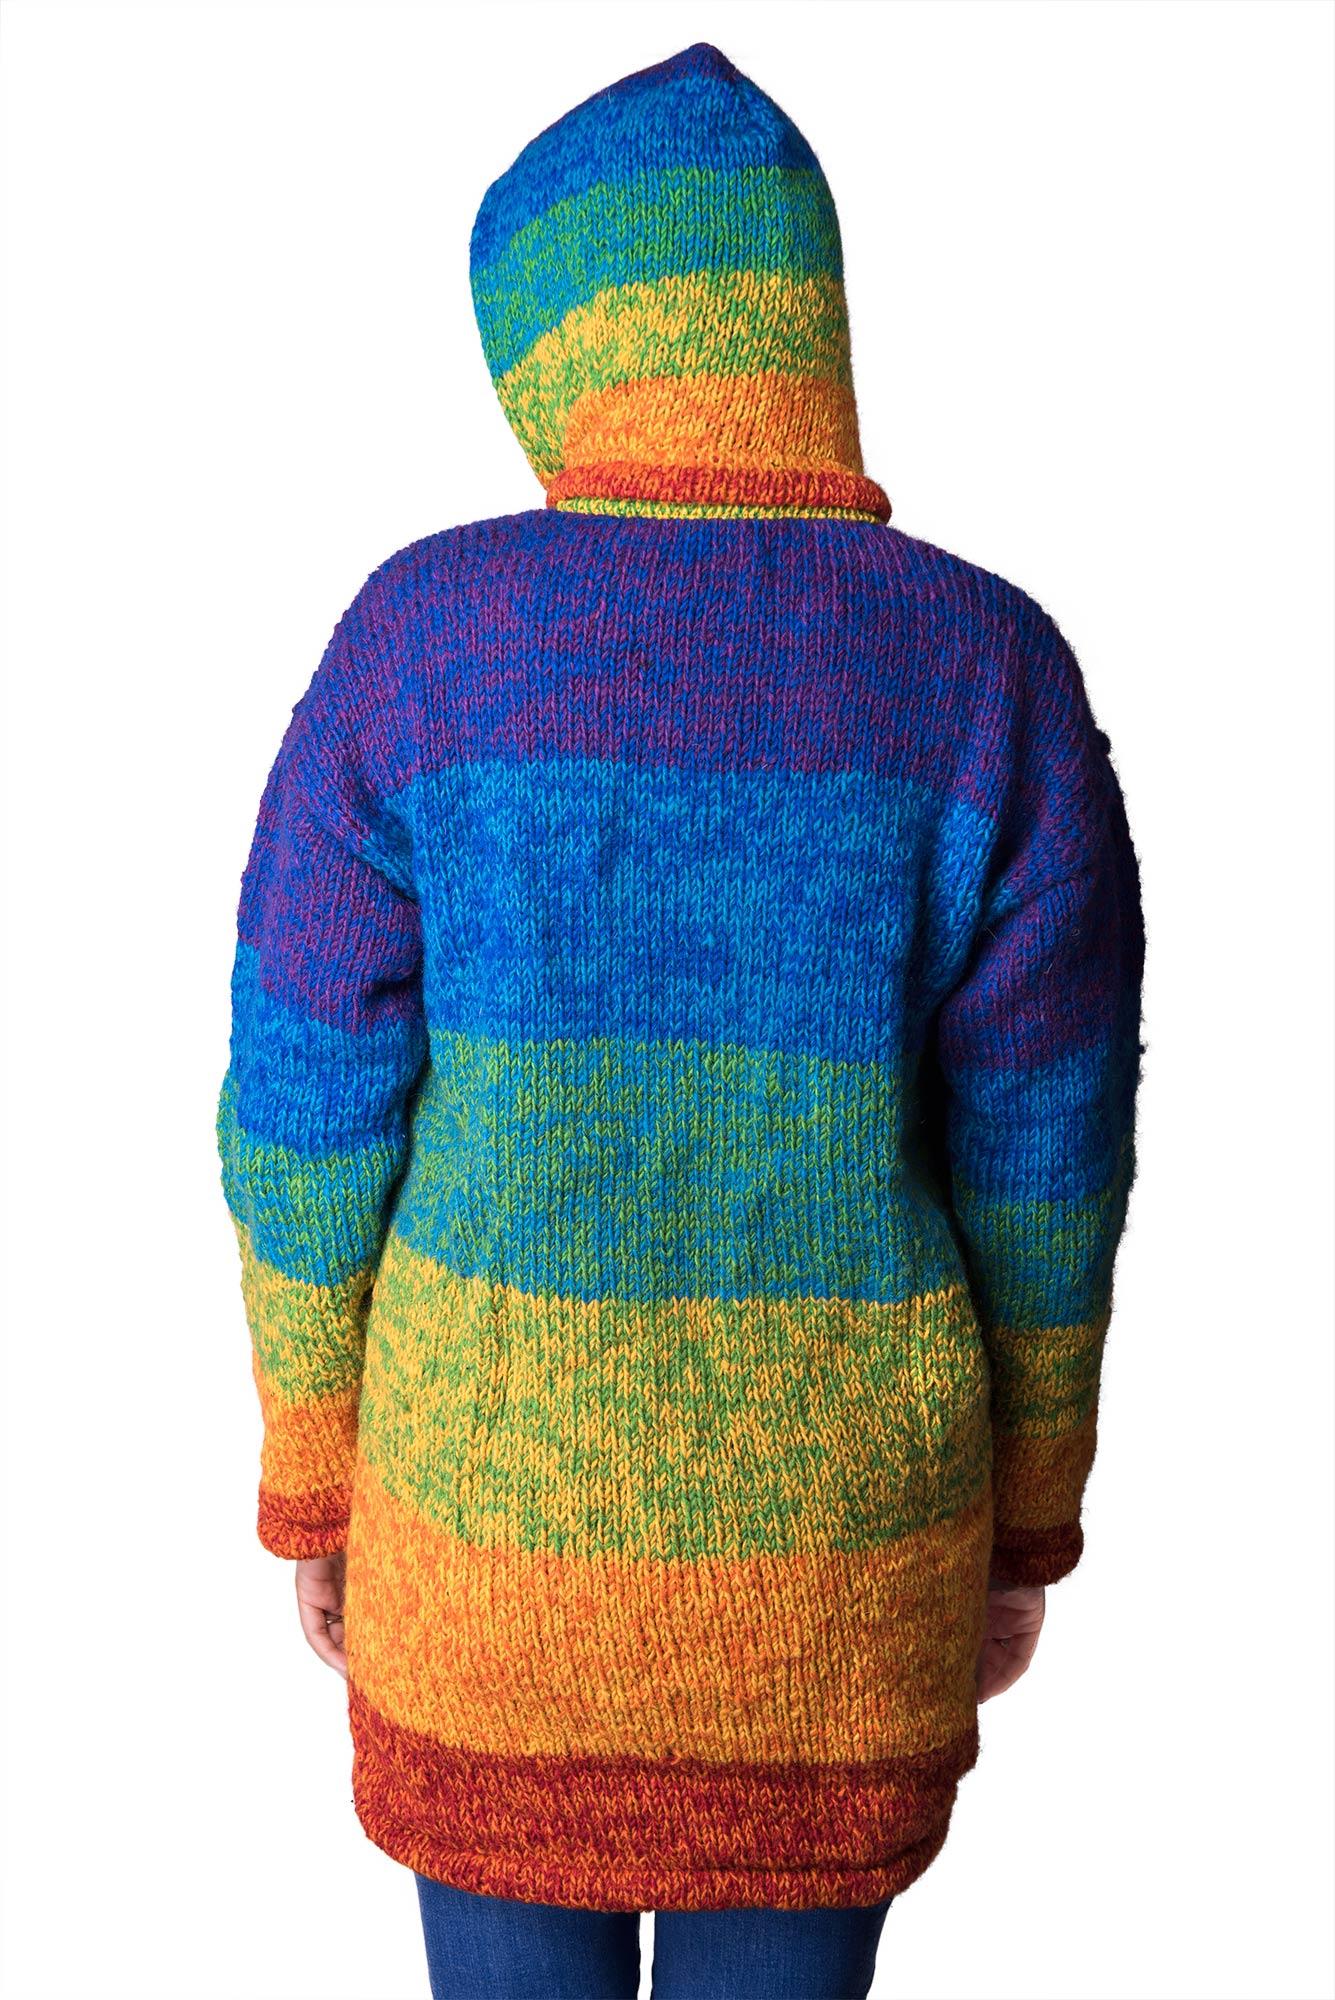 Wool Himalayan Mountain Jacket – Long Length Rainbow